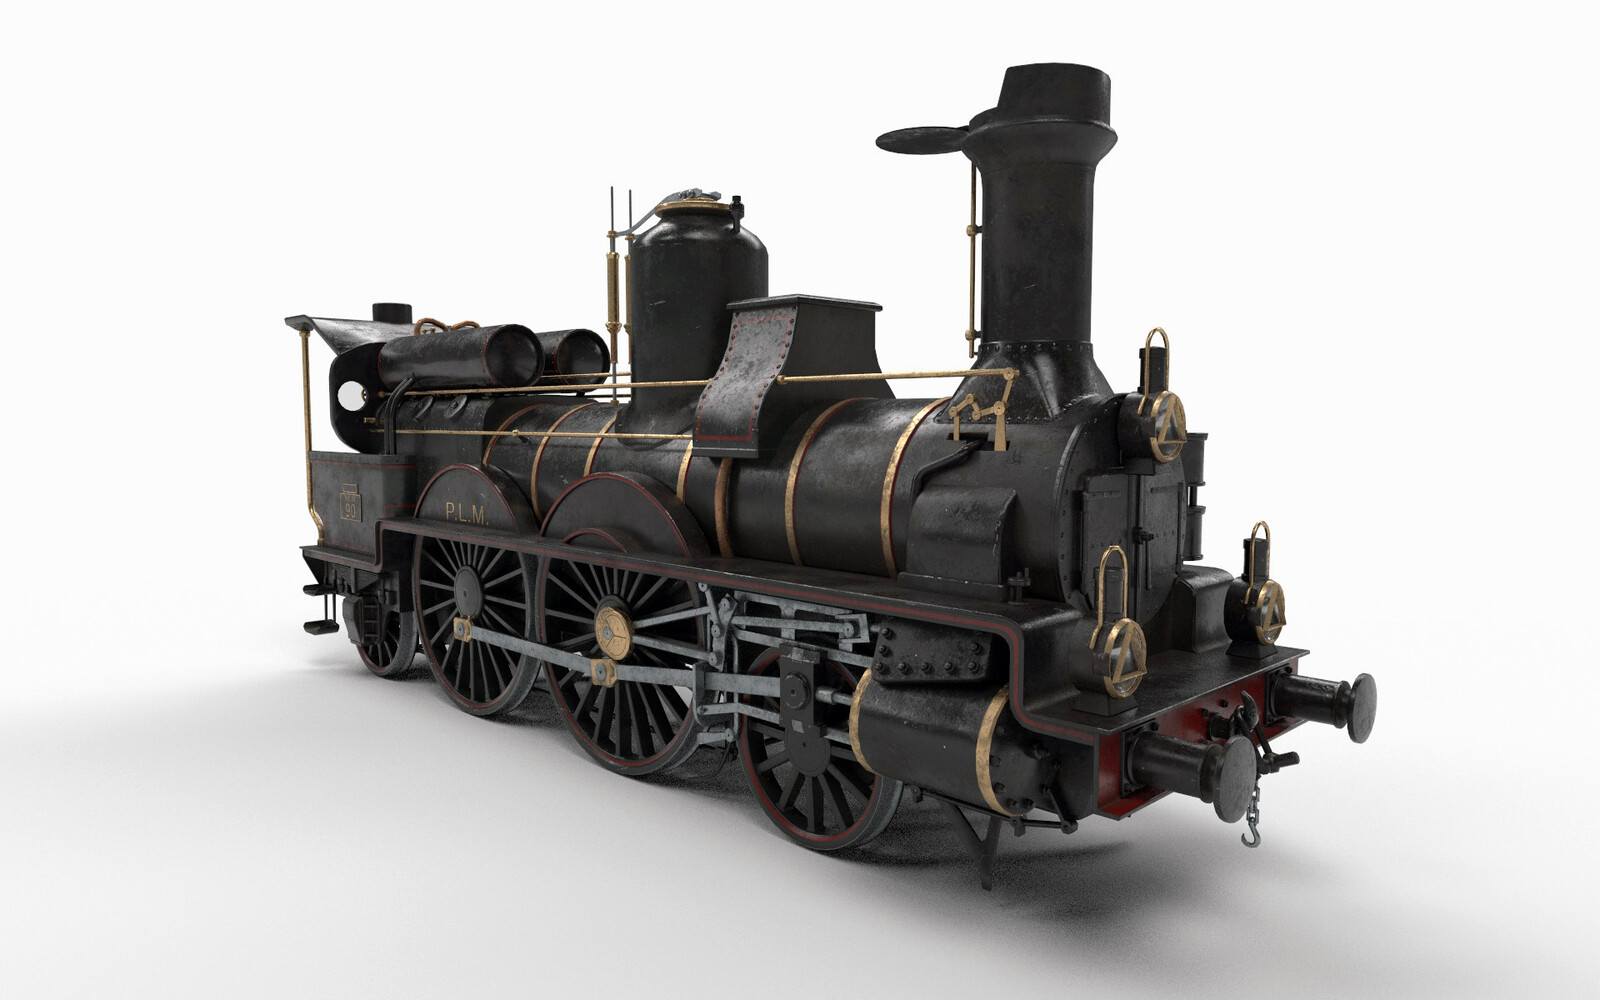 Class 121 (historical train)